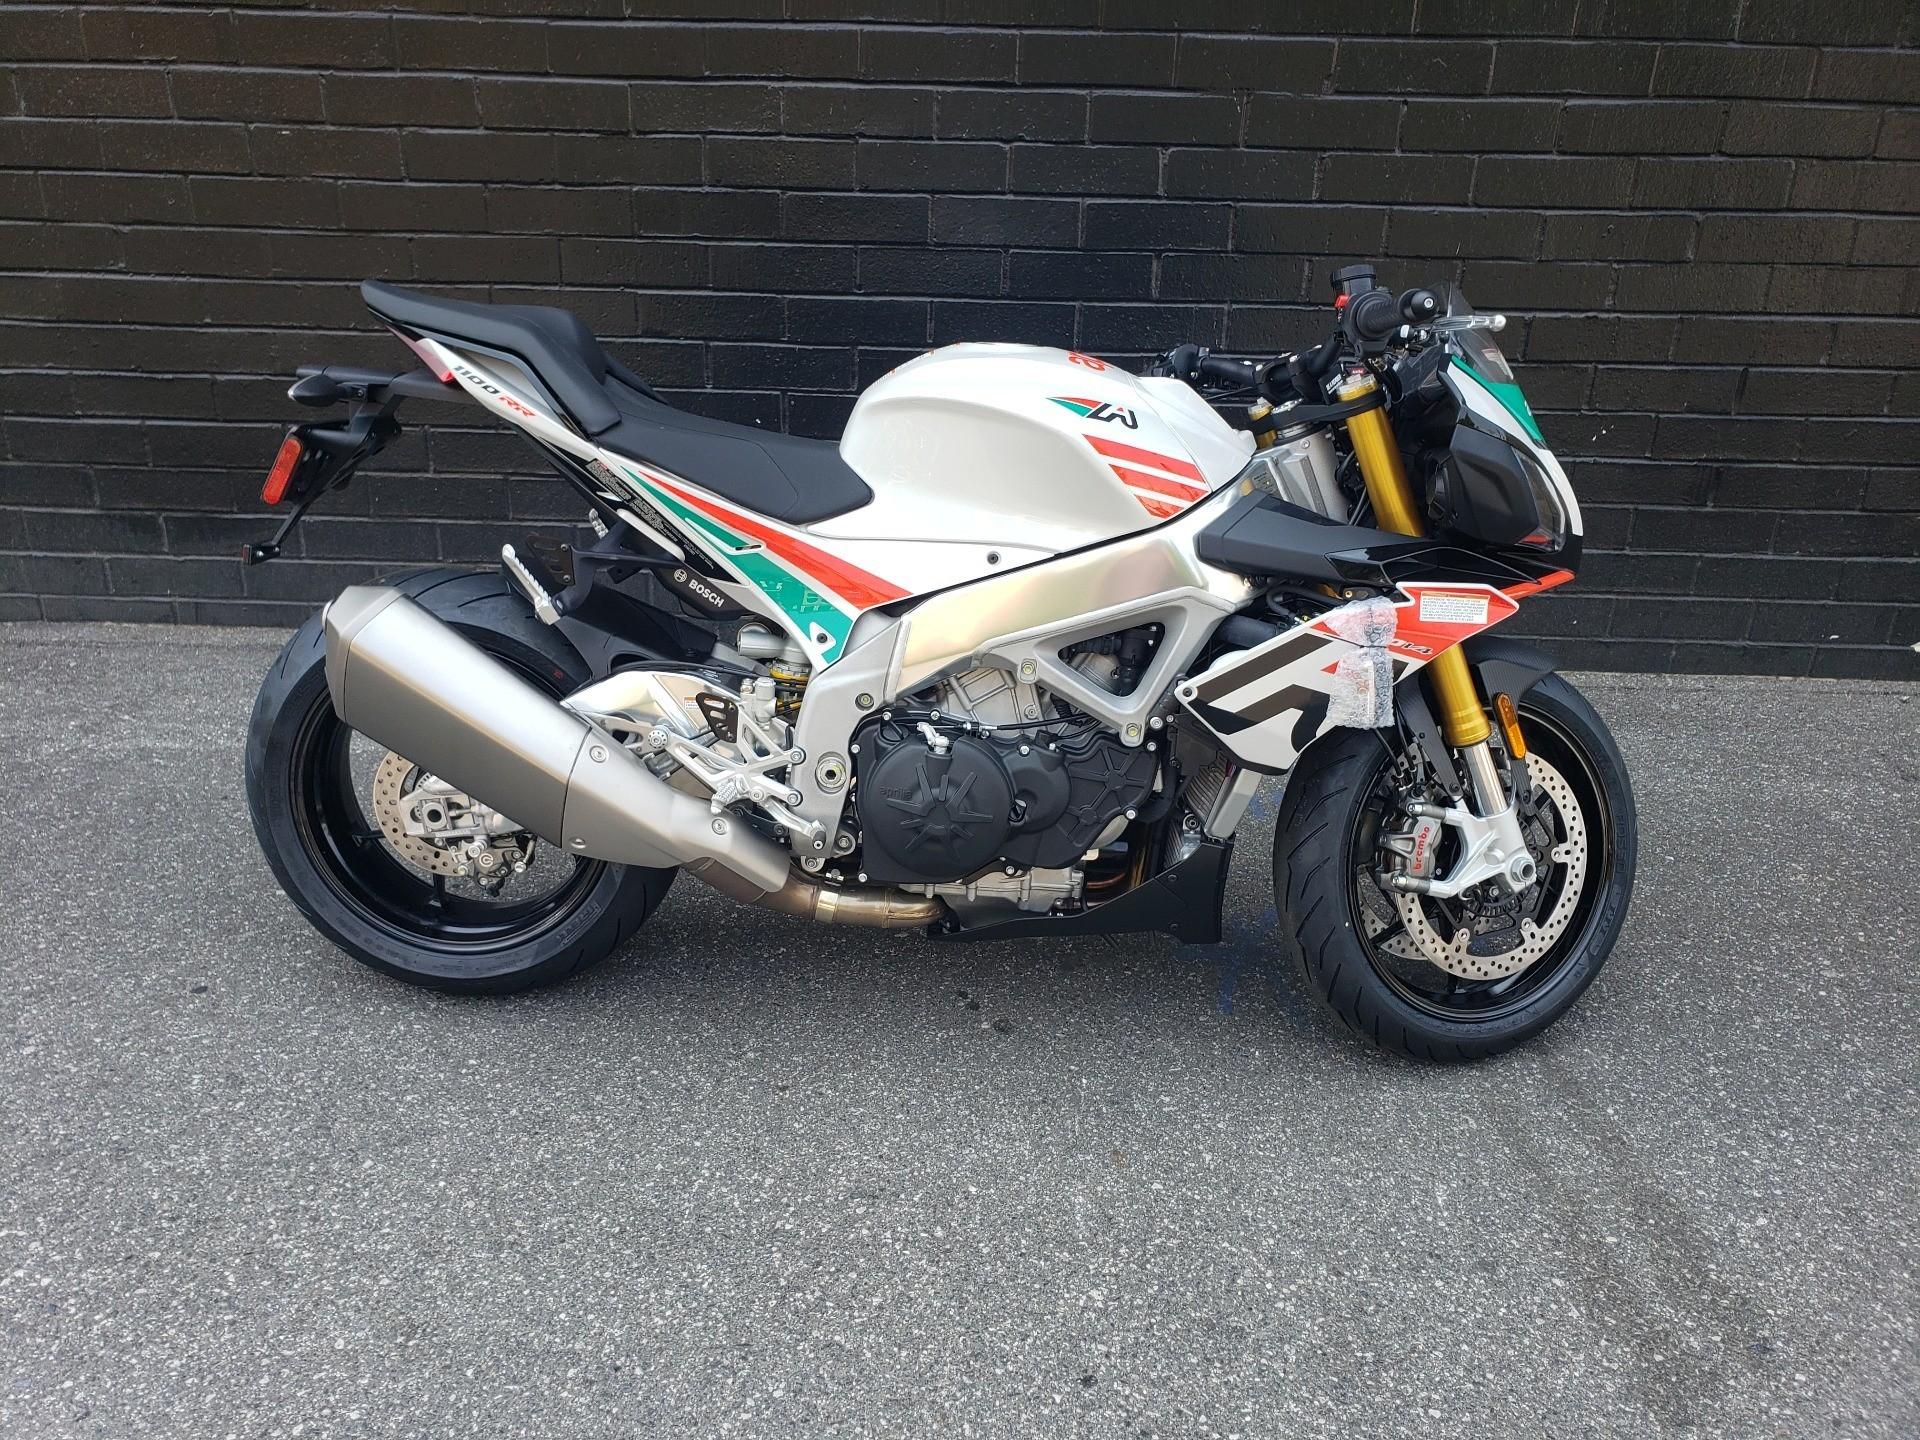 New 2020 Aprilia Tuono V4 1100 Rr Misano Limited Edition Motorcycles In San Jose Ca Stock Number Aa0060